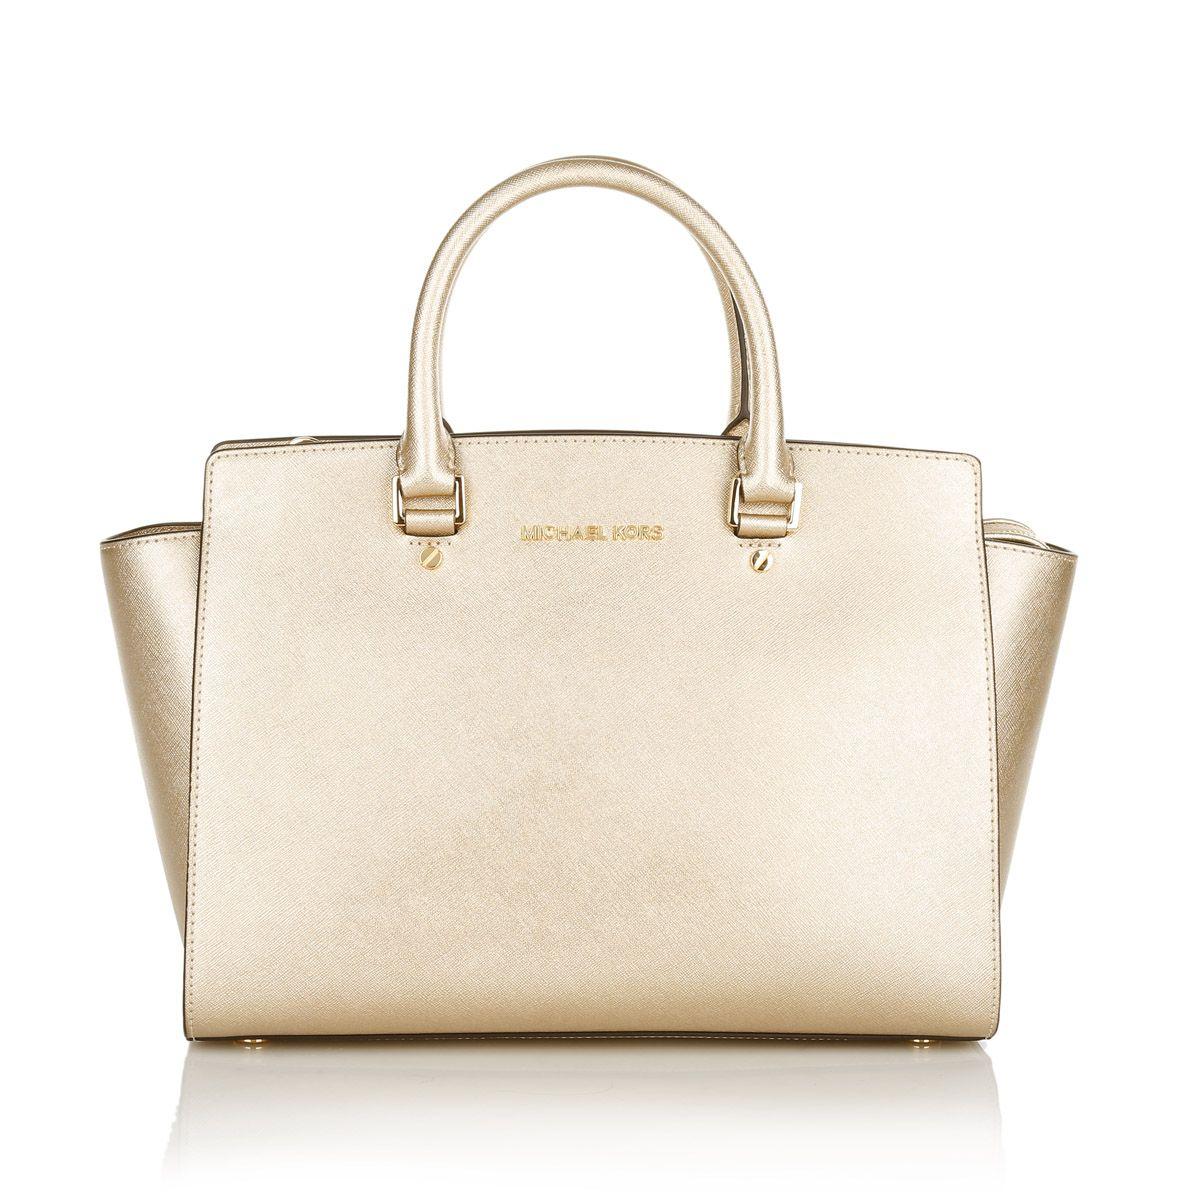 Michael kors bags in dubai - Michael Kors Fashionette S Best Buy Selma